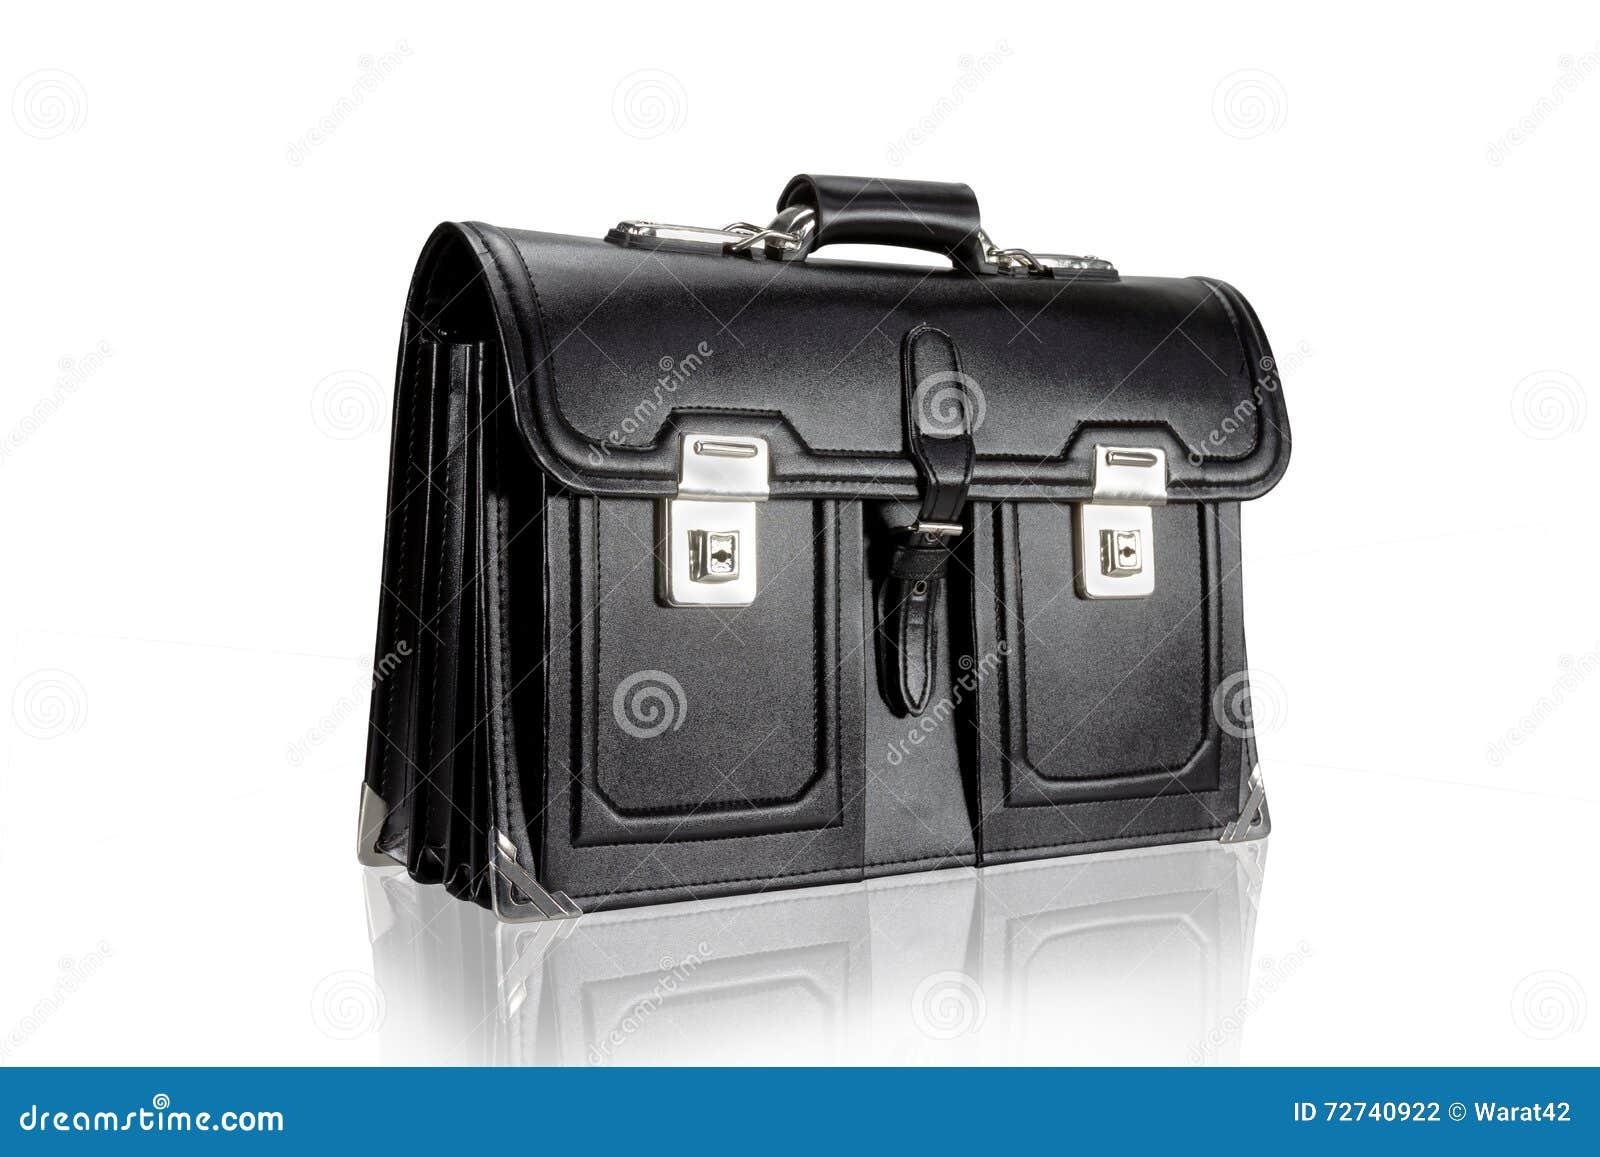 0cf060a682 Μαύρη αναδρομική σχολική τσάντα δέρματος που απομονώνεται στο άσπρο υπόβαθρο